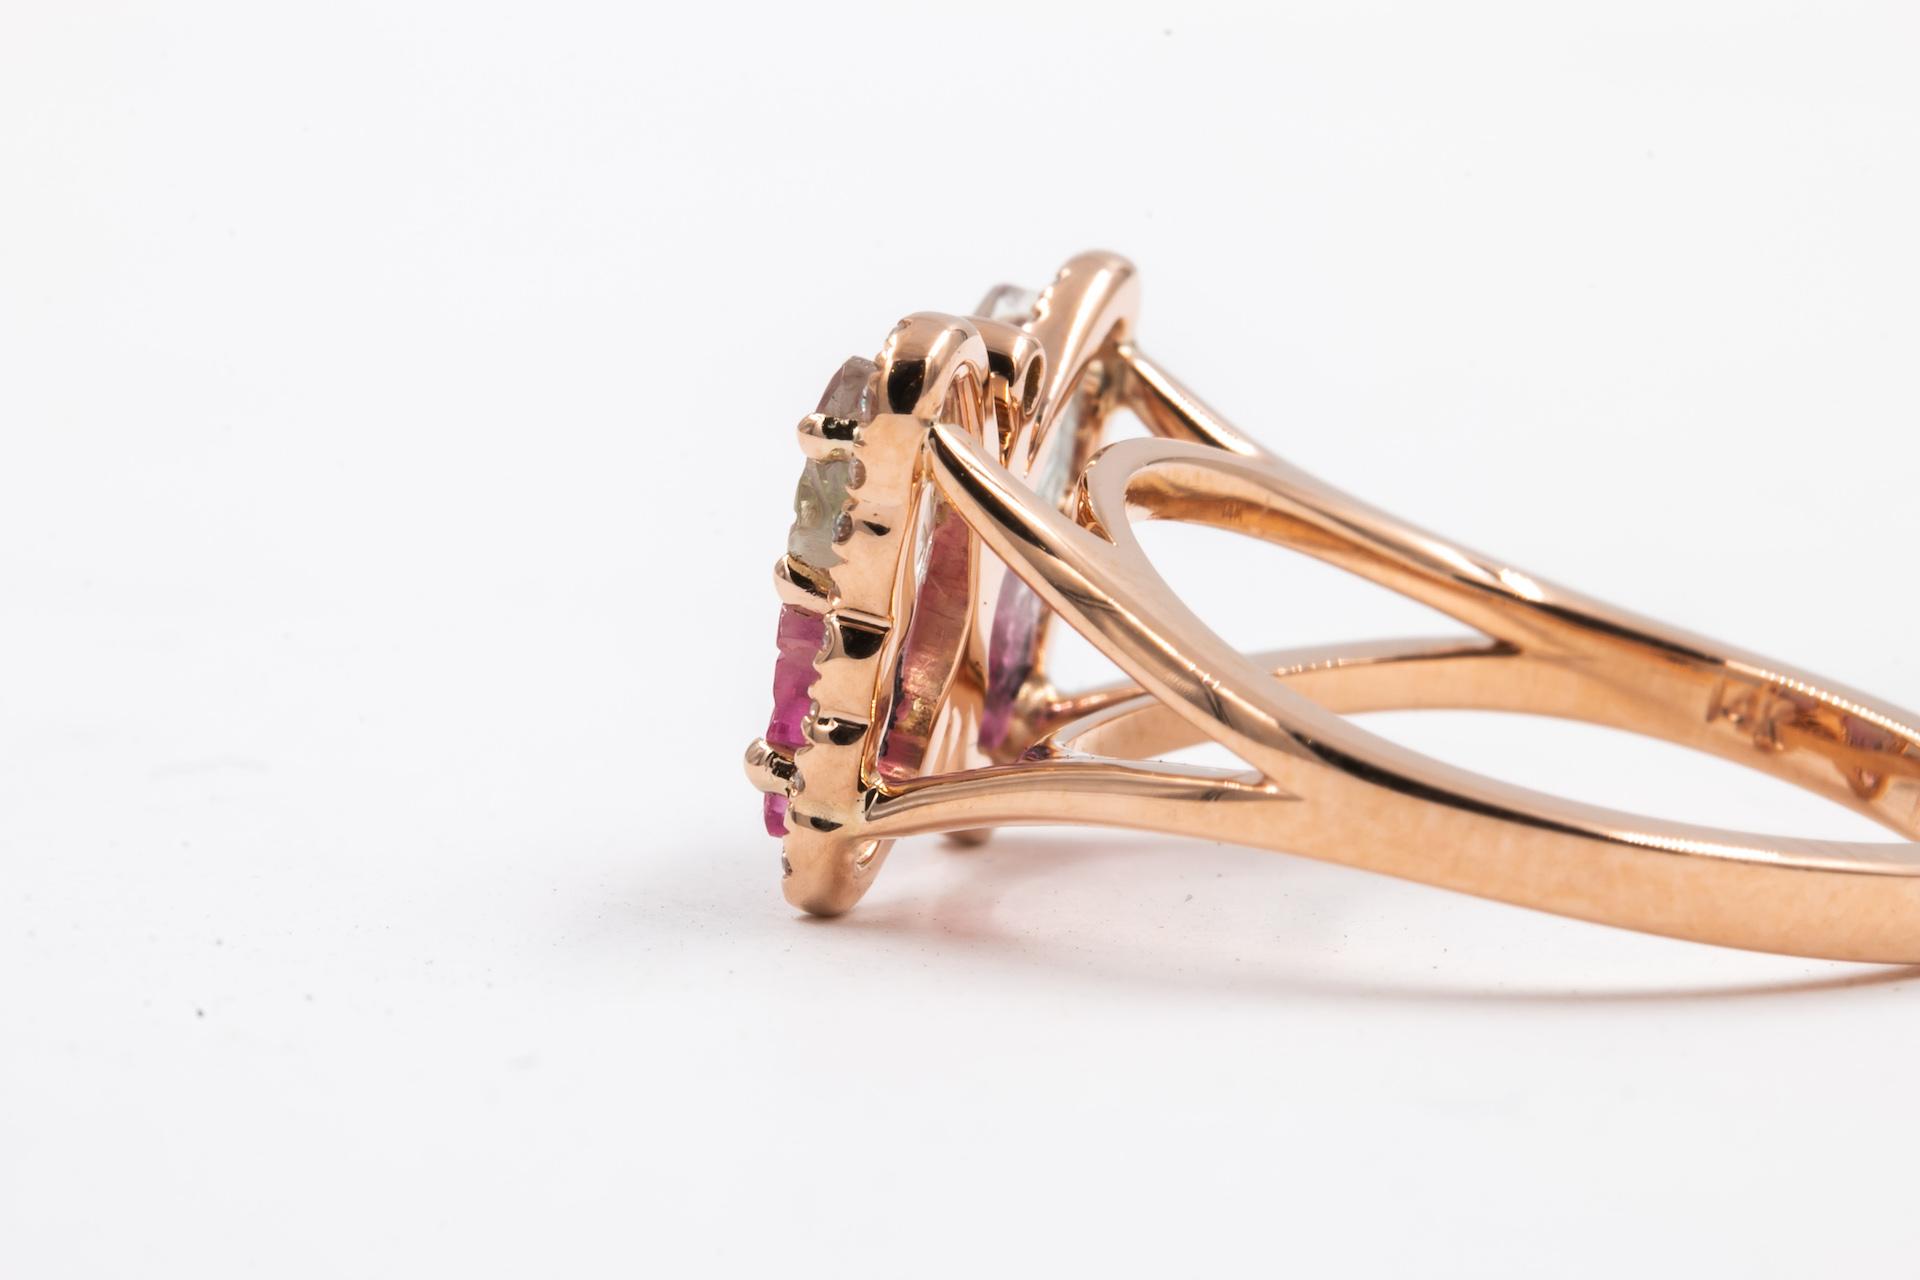 watermelon-tourmaline-ring-butterfly-jewelry-diamonds-2